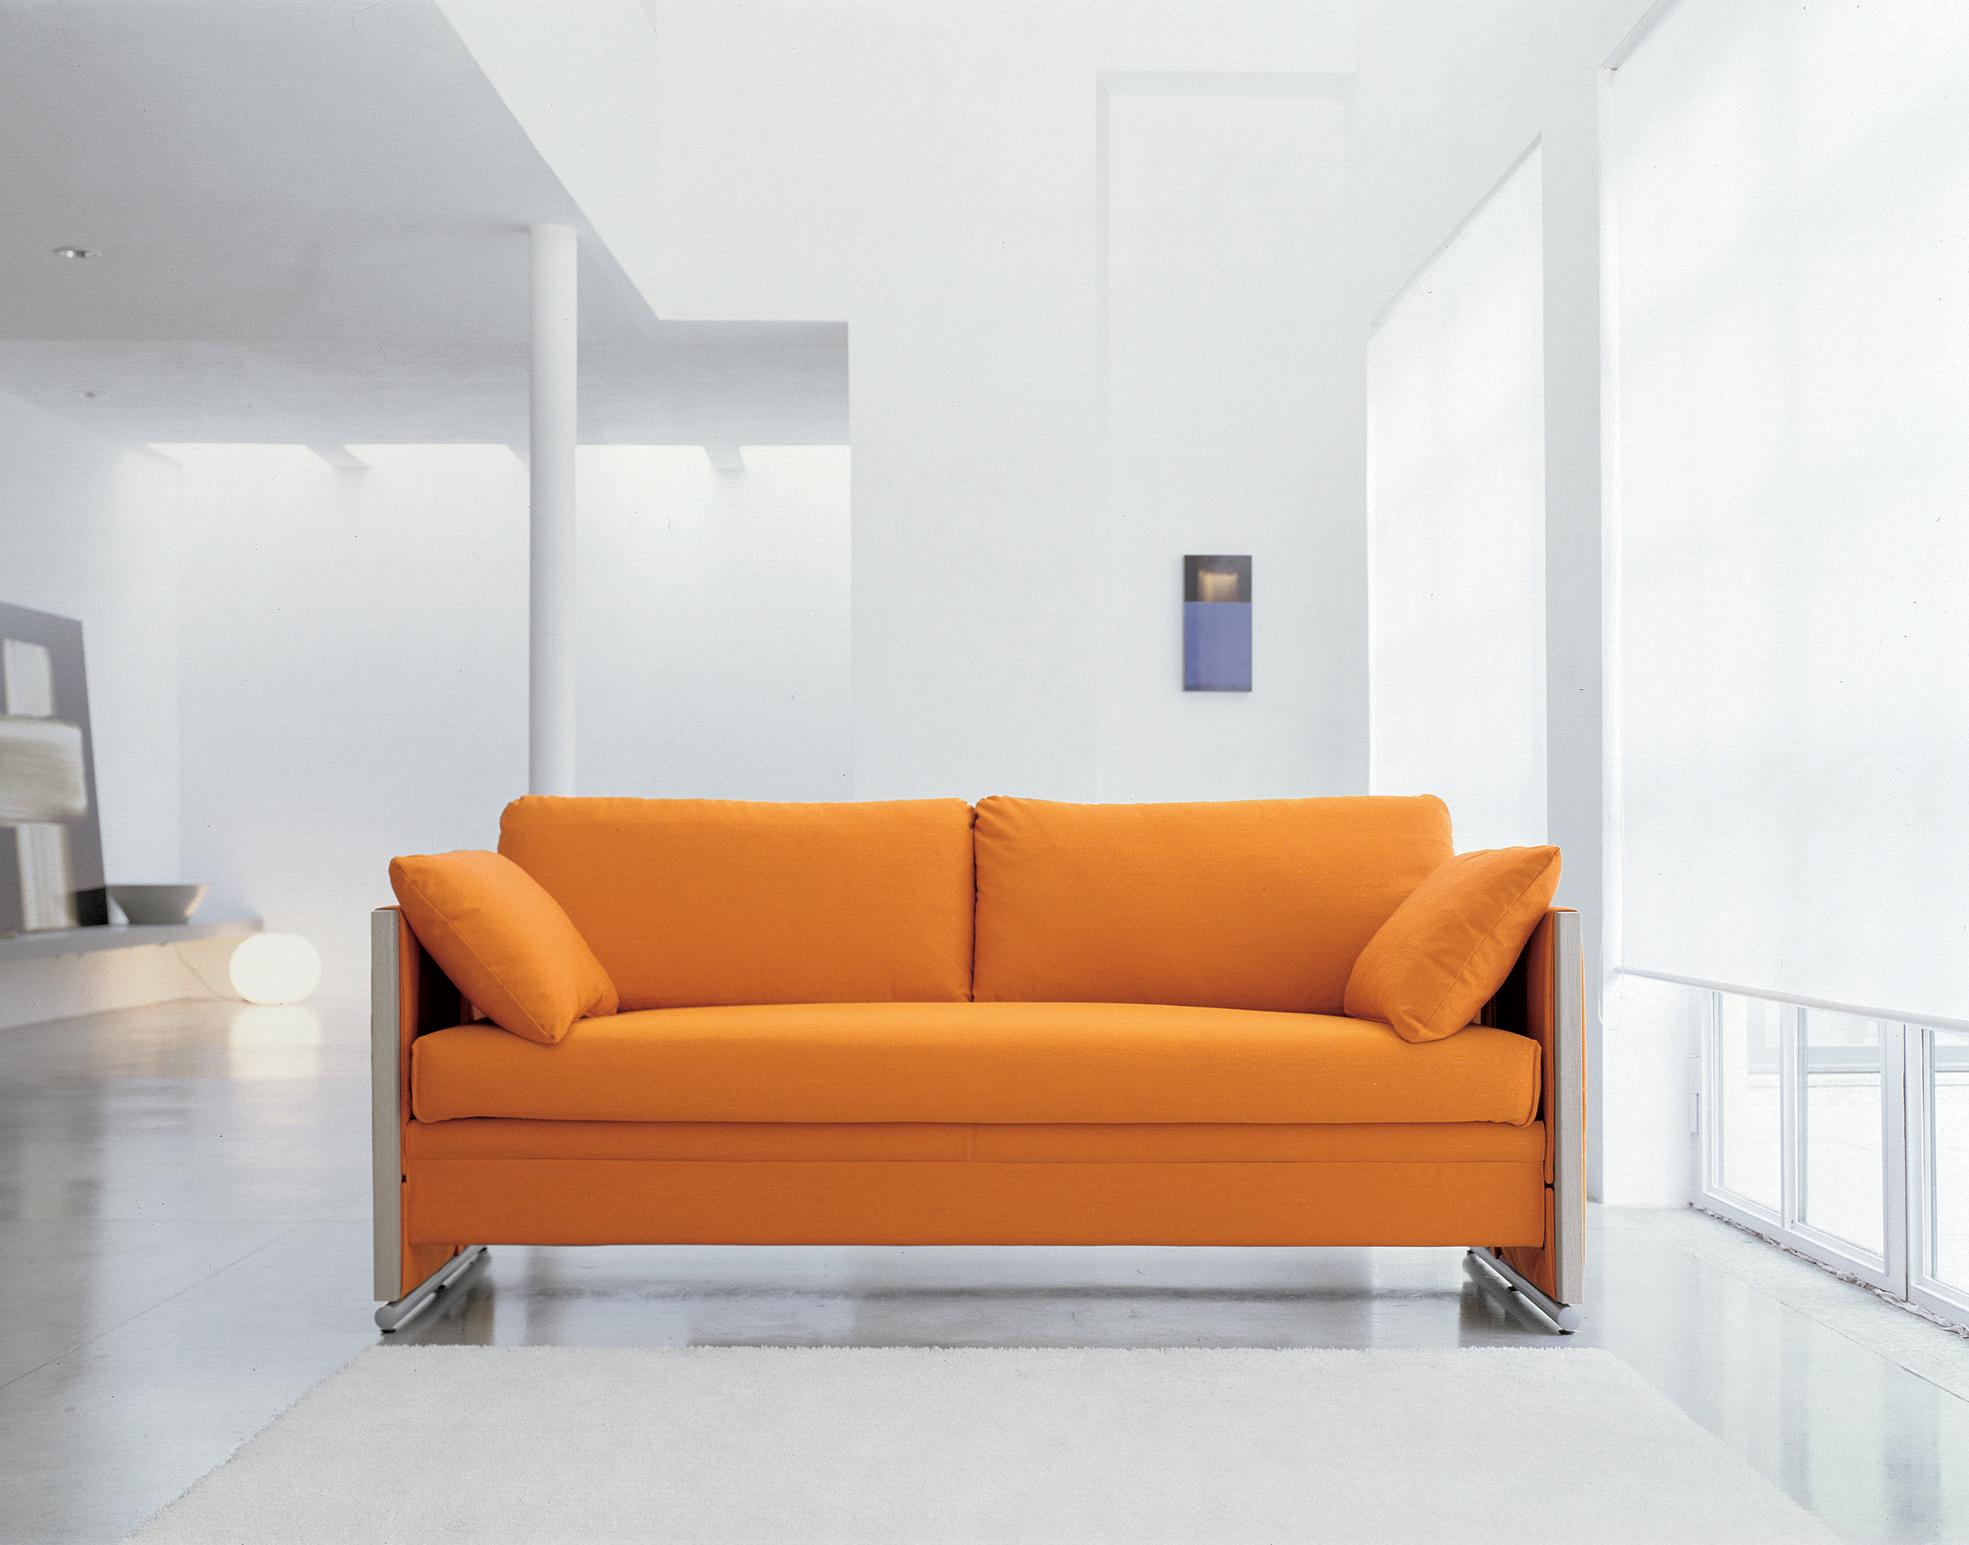 design sofas 31 creative furniture design ideas for small homes FPGQPWU